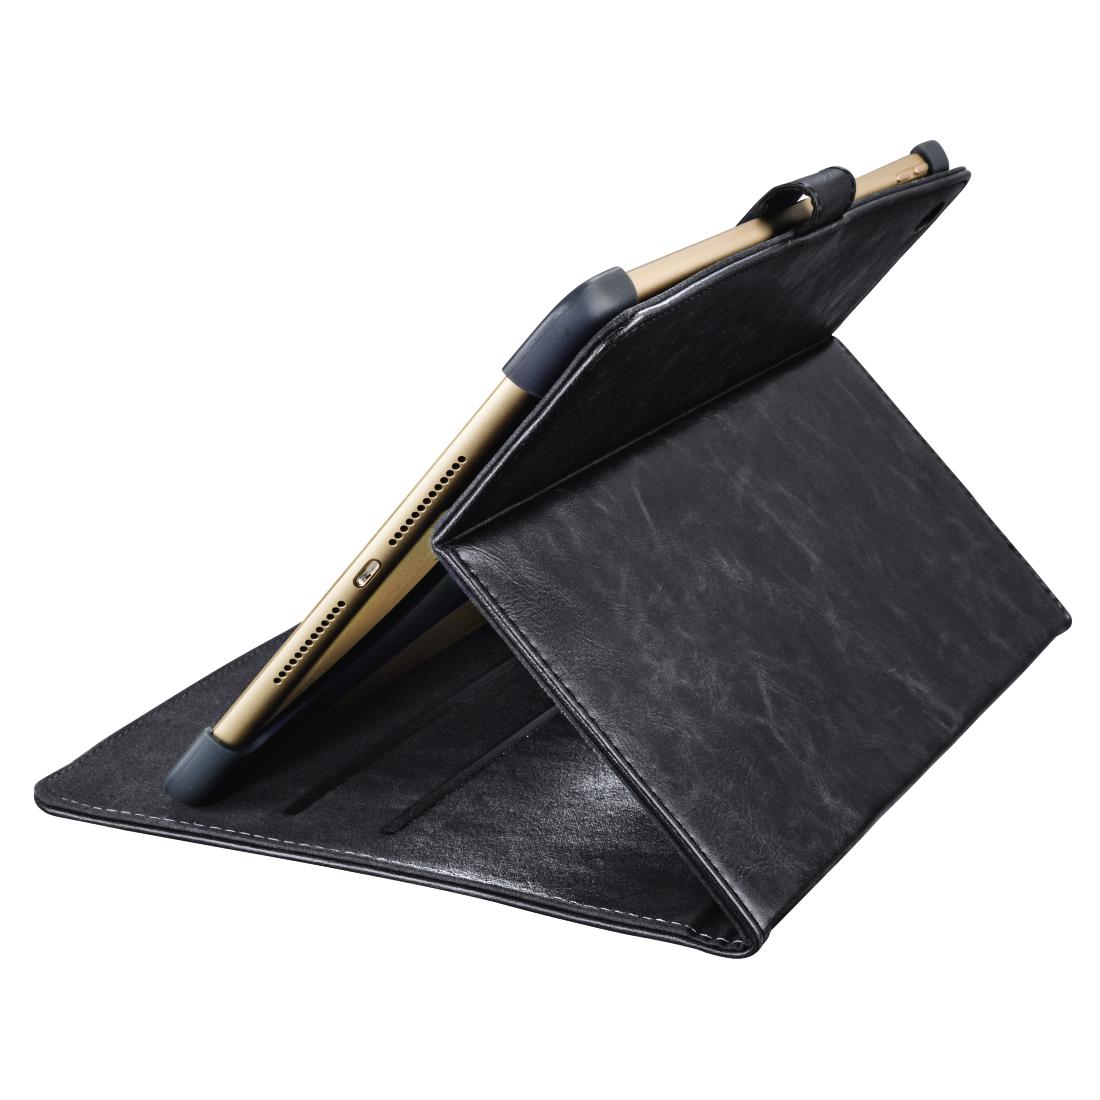 00106456 hama tablet case noble f r apple ipad 9 7 2017. Black Bedroom Furniture Sets. Home Design Ideas